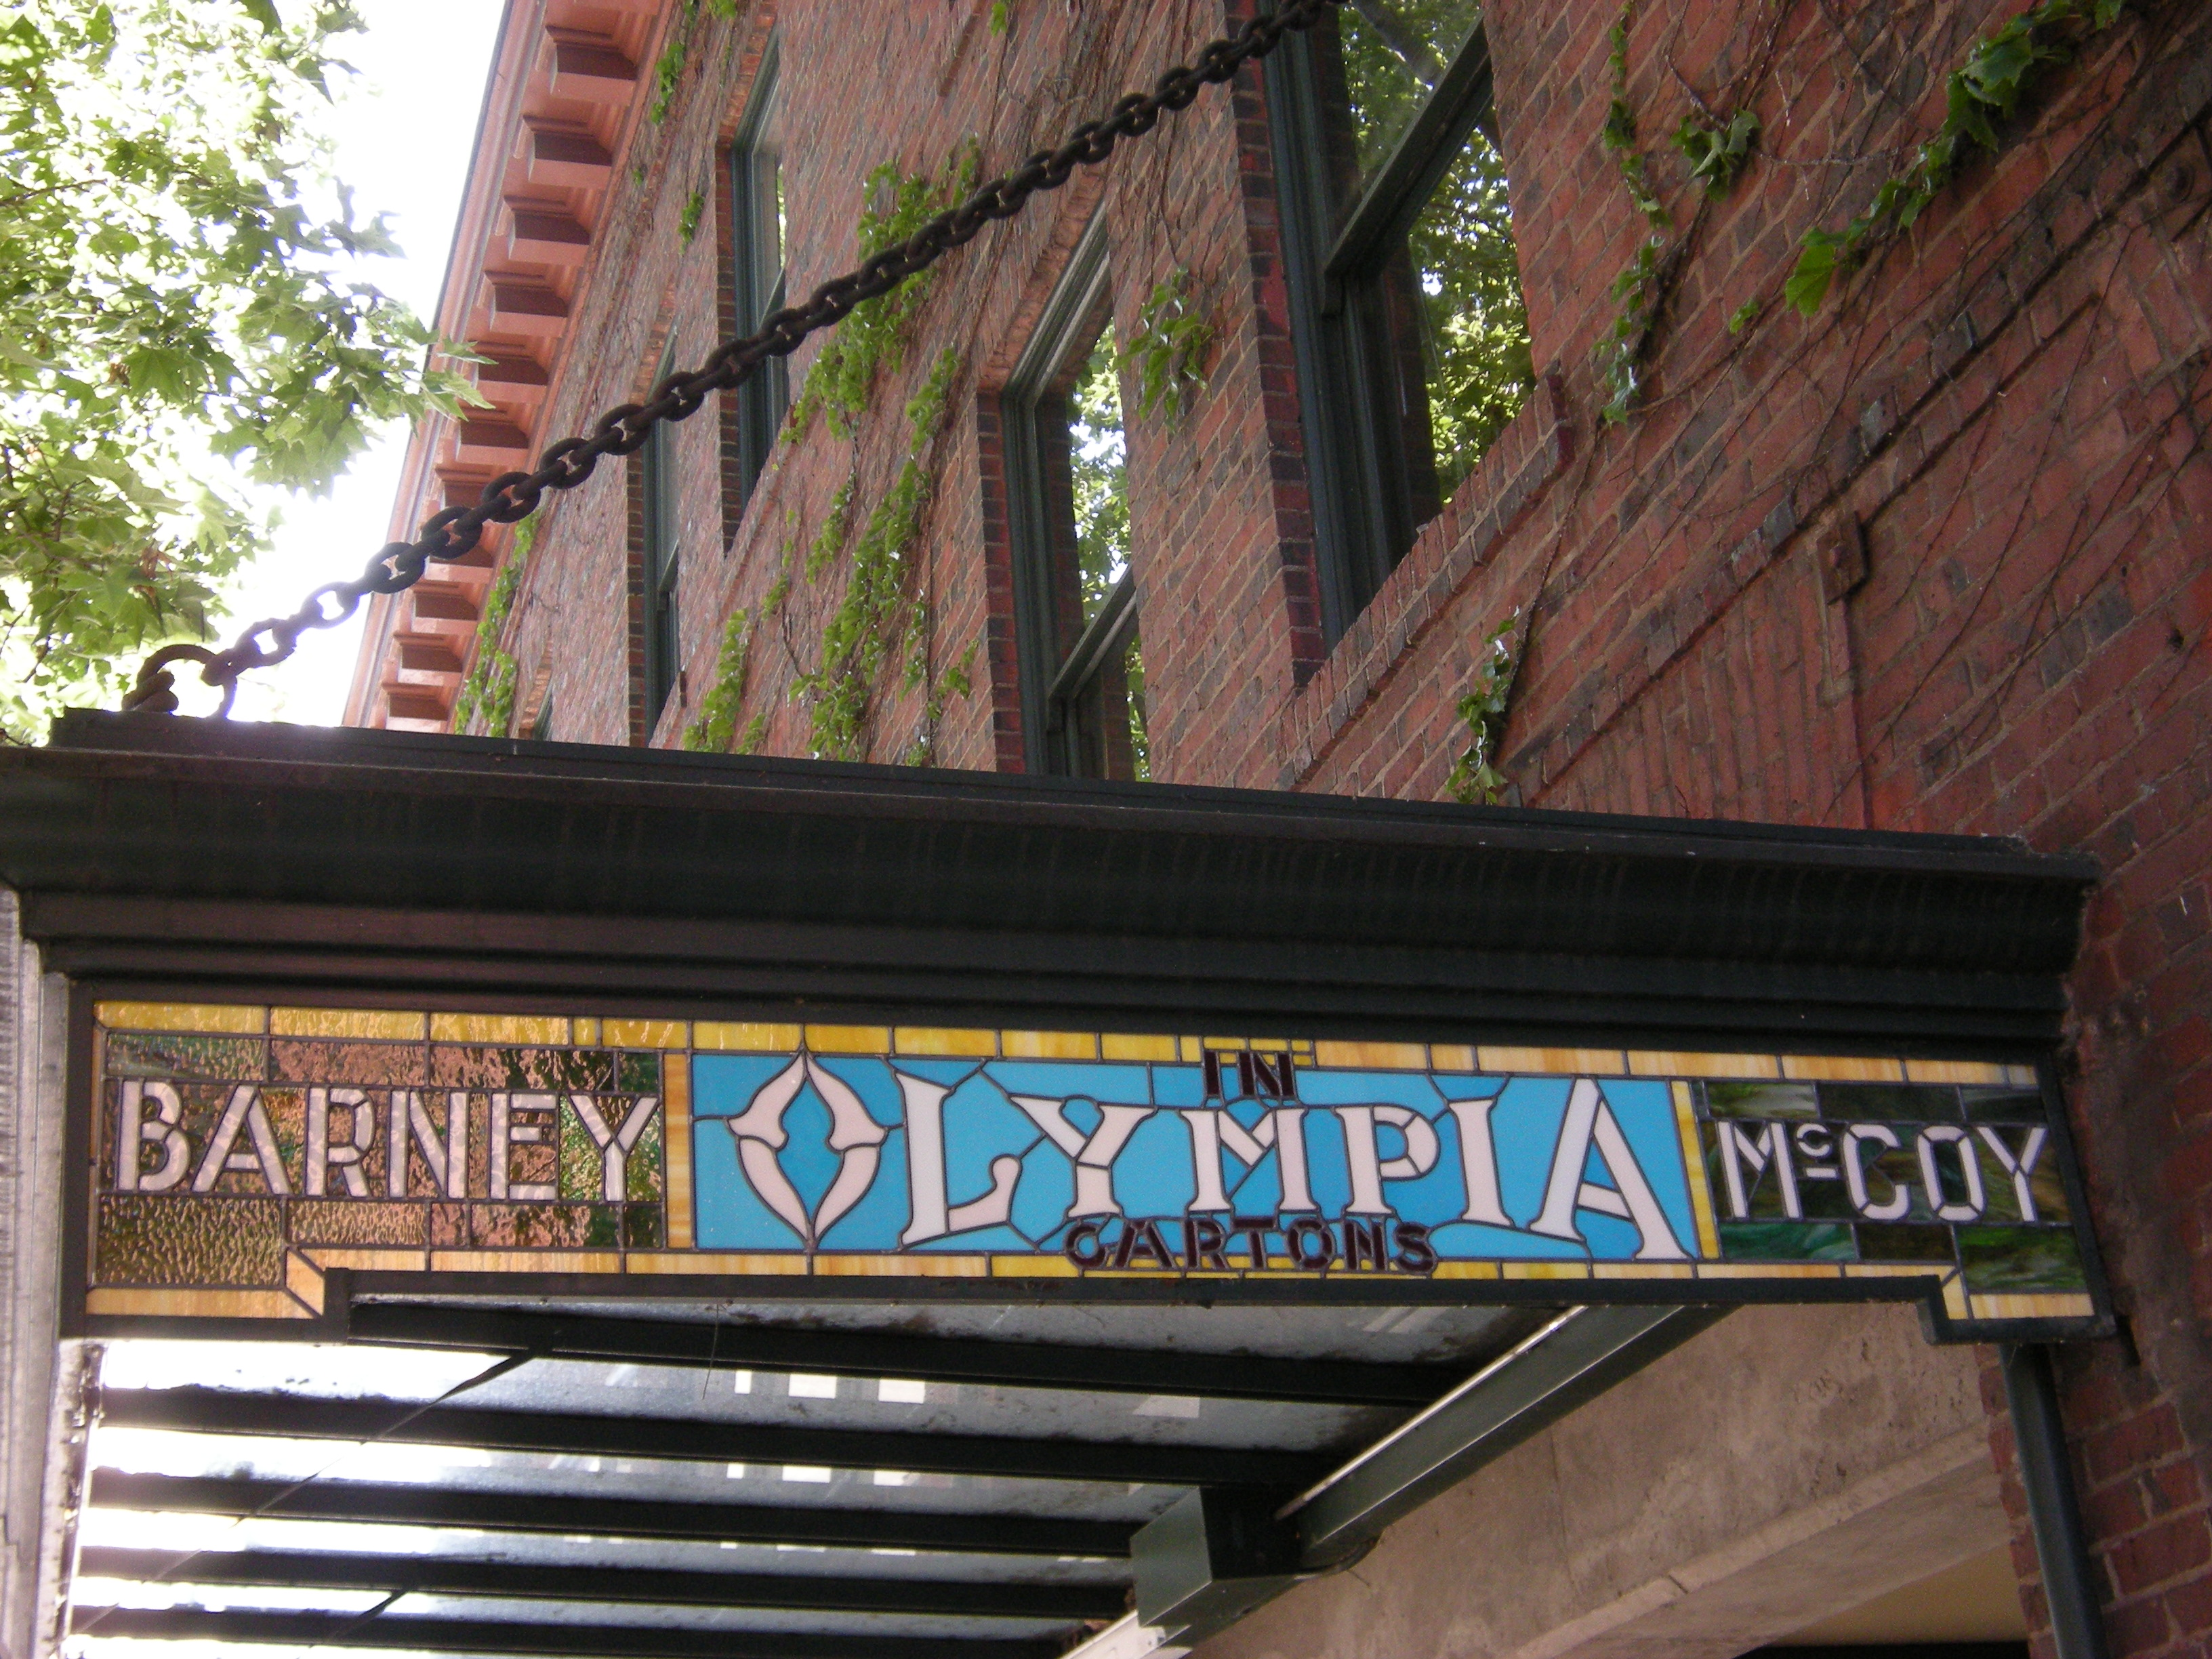 File:Seattle - Barney McCoy awning sign 01.jpg - Wikimedia ...